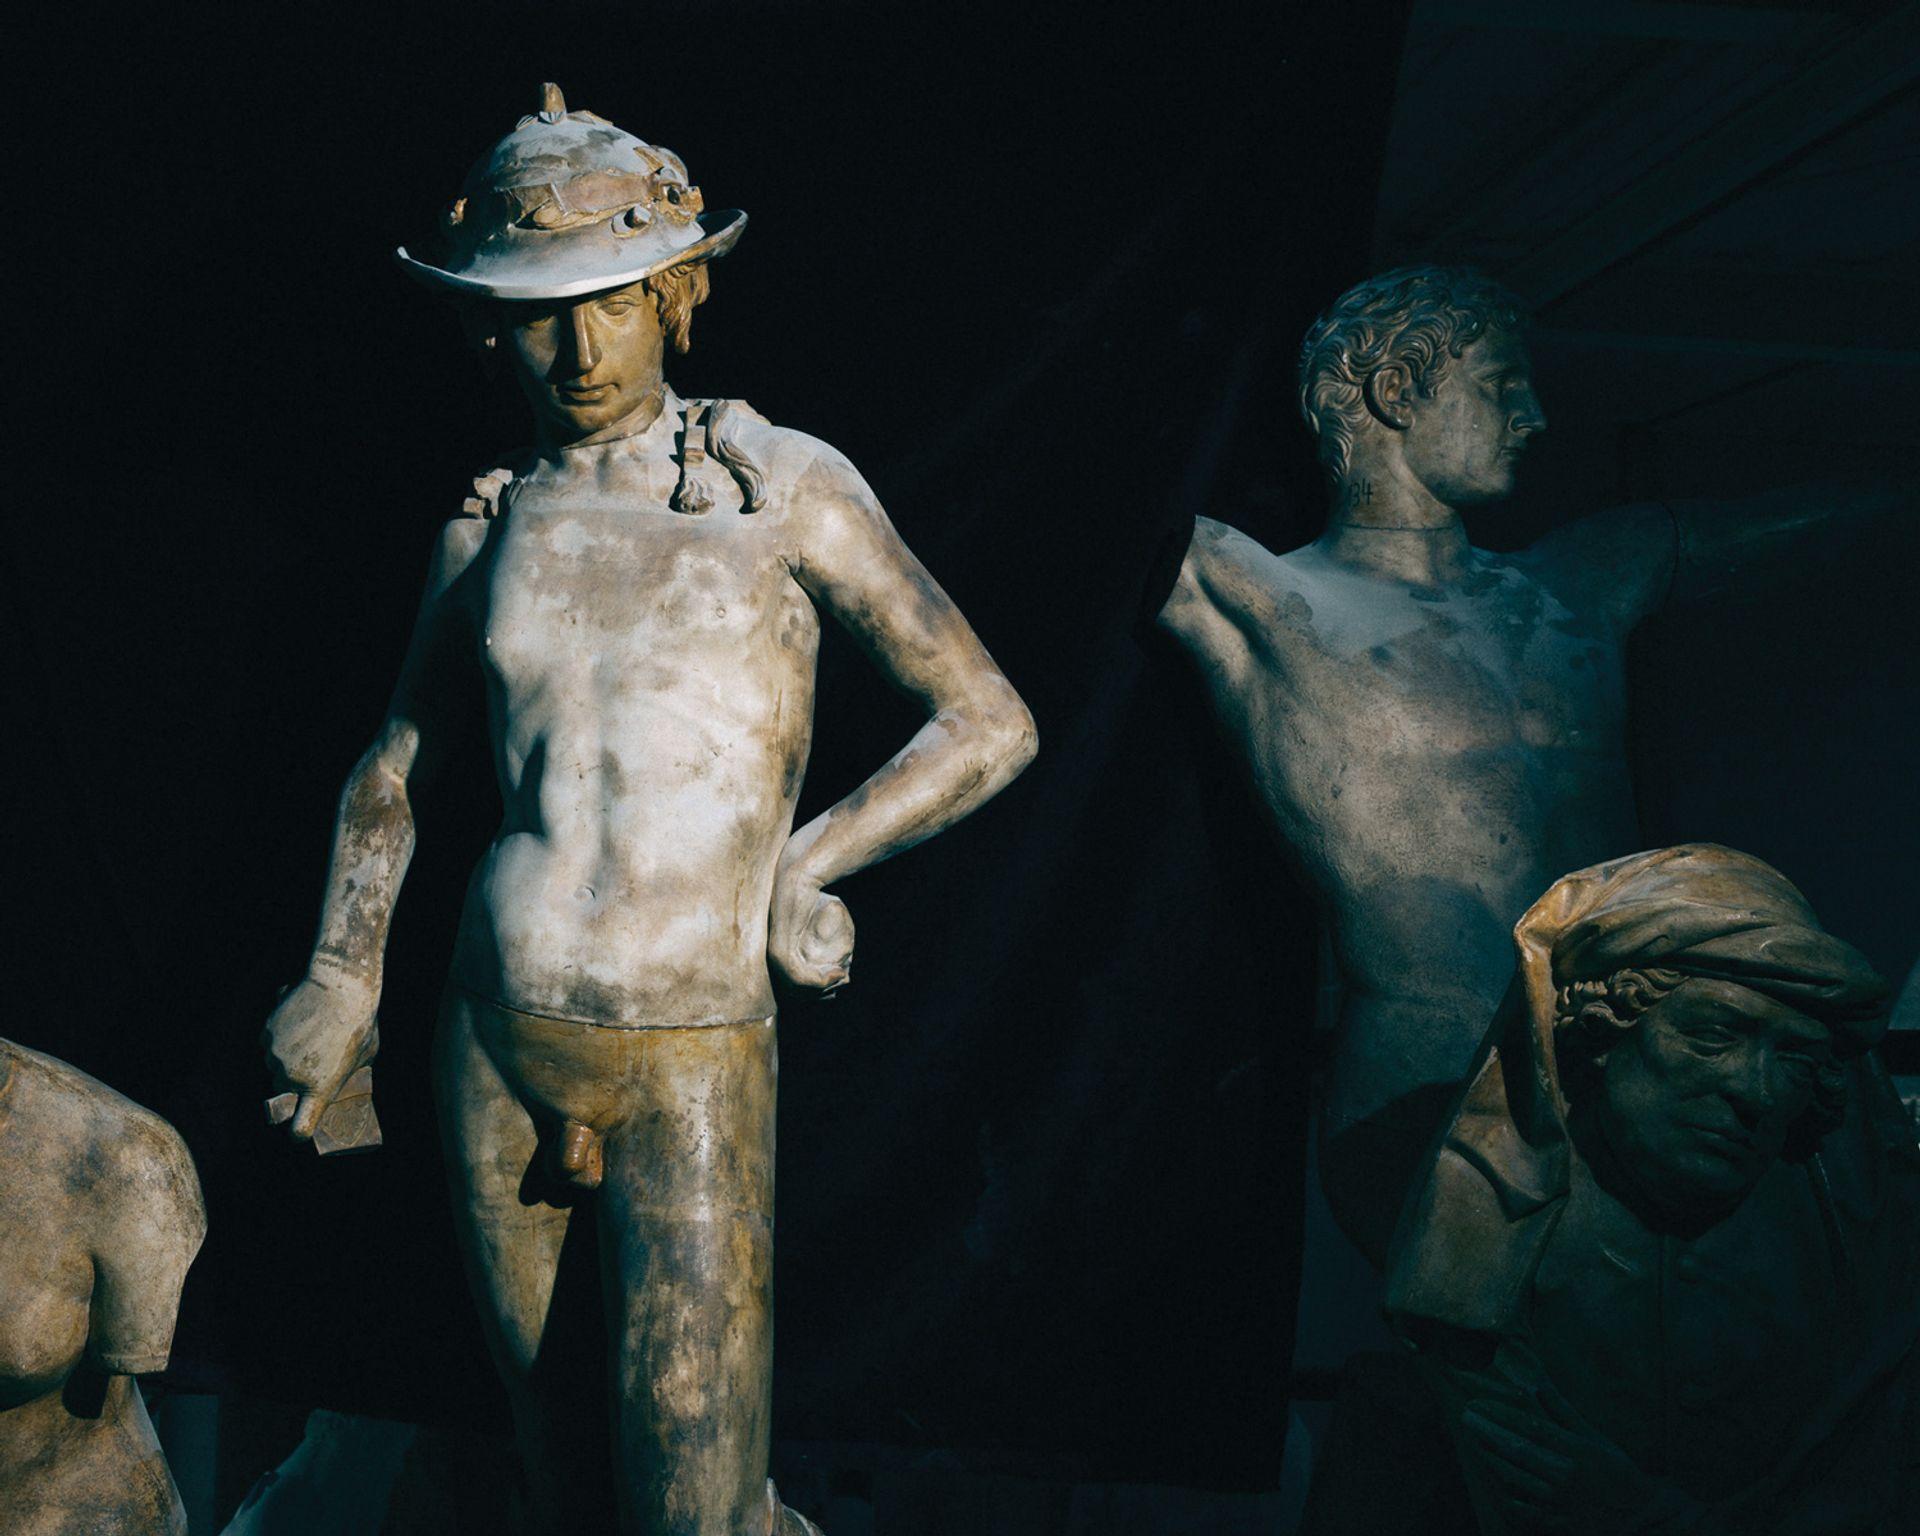 The Gipsformerei's master model for Donatello's 15th-century bronze of David ©Daniel Hofer